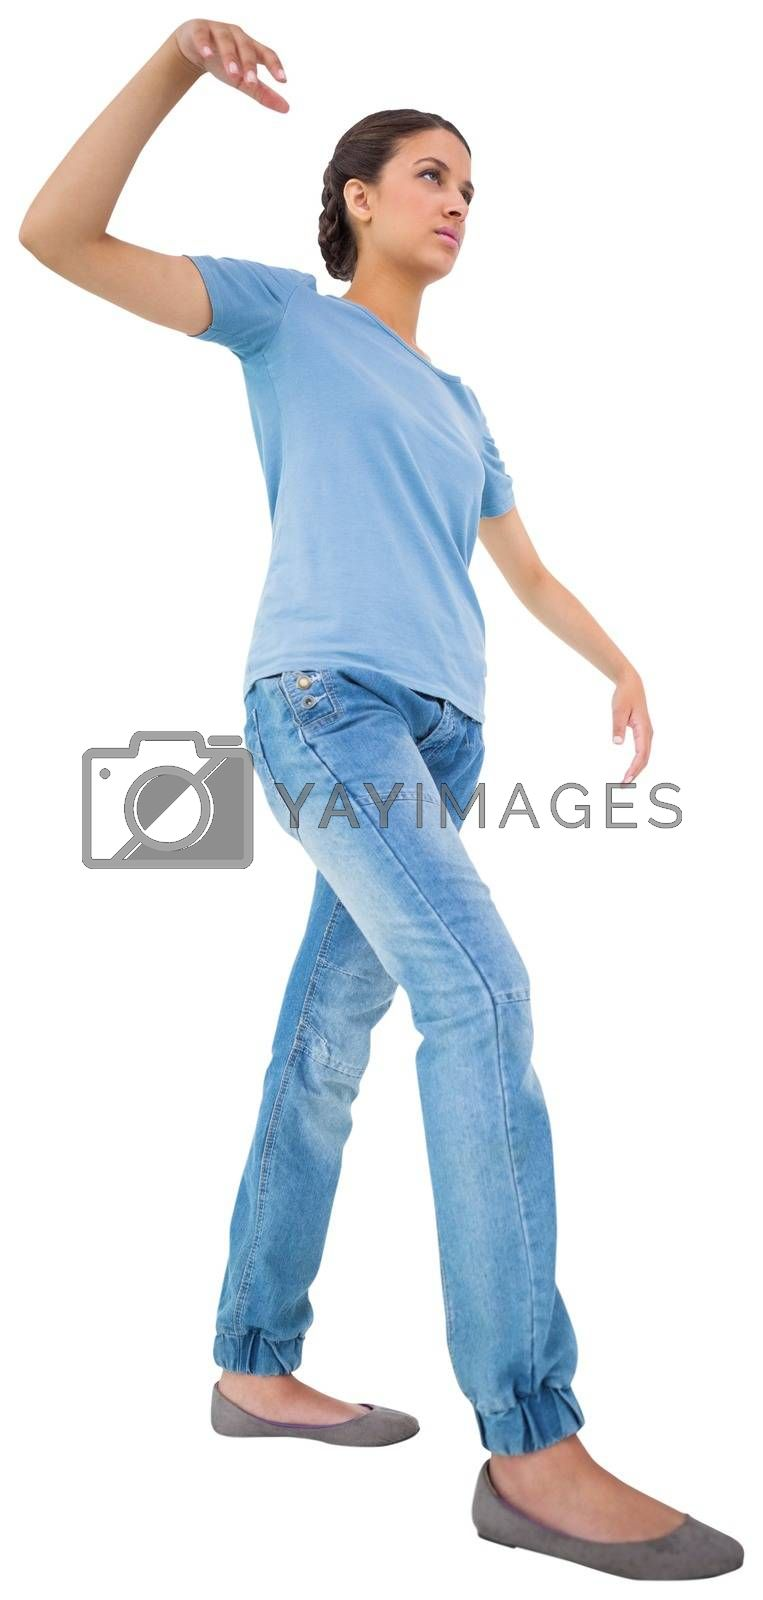 Royalty free image of Powerless brunette in jeans and tshirt by Wavebreakmedia